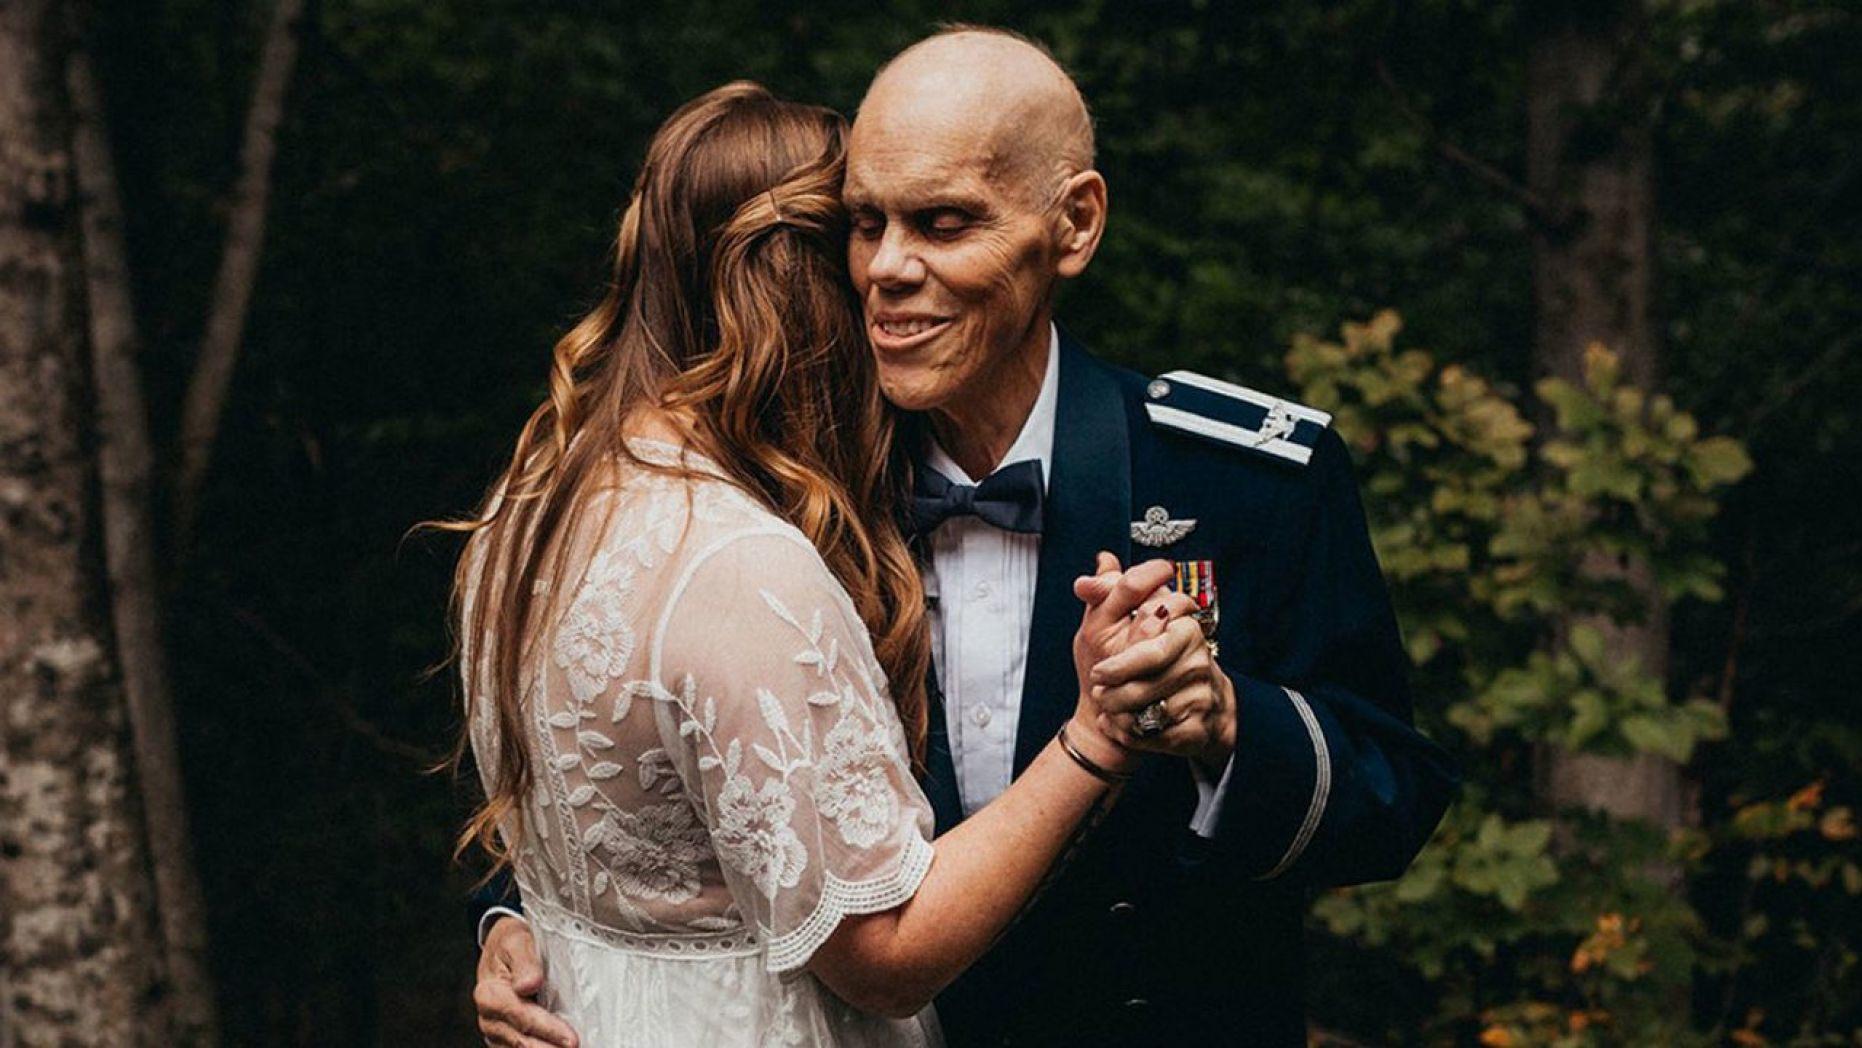 Bride-Father-2_1555611314103-846652698.jpg